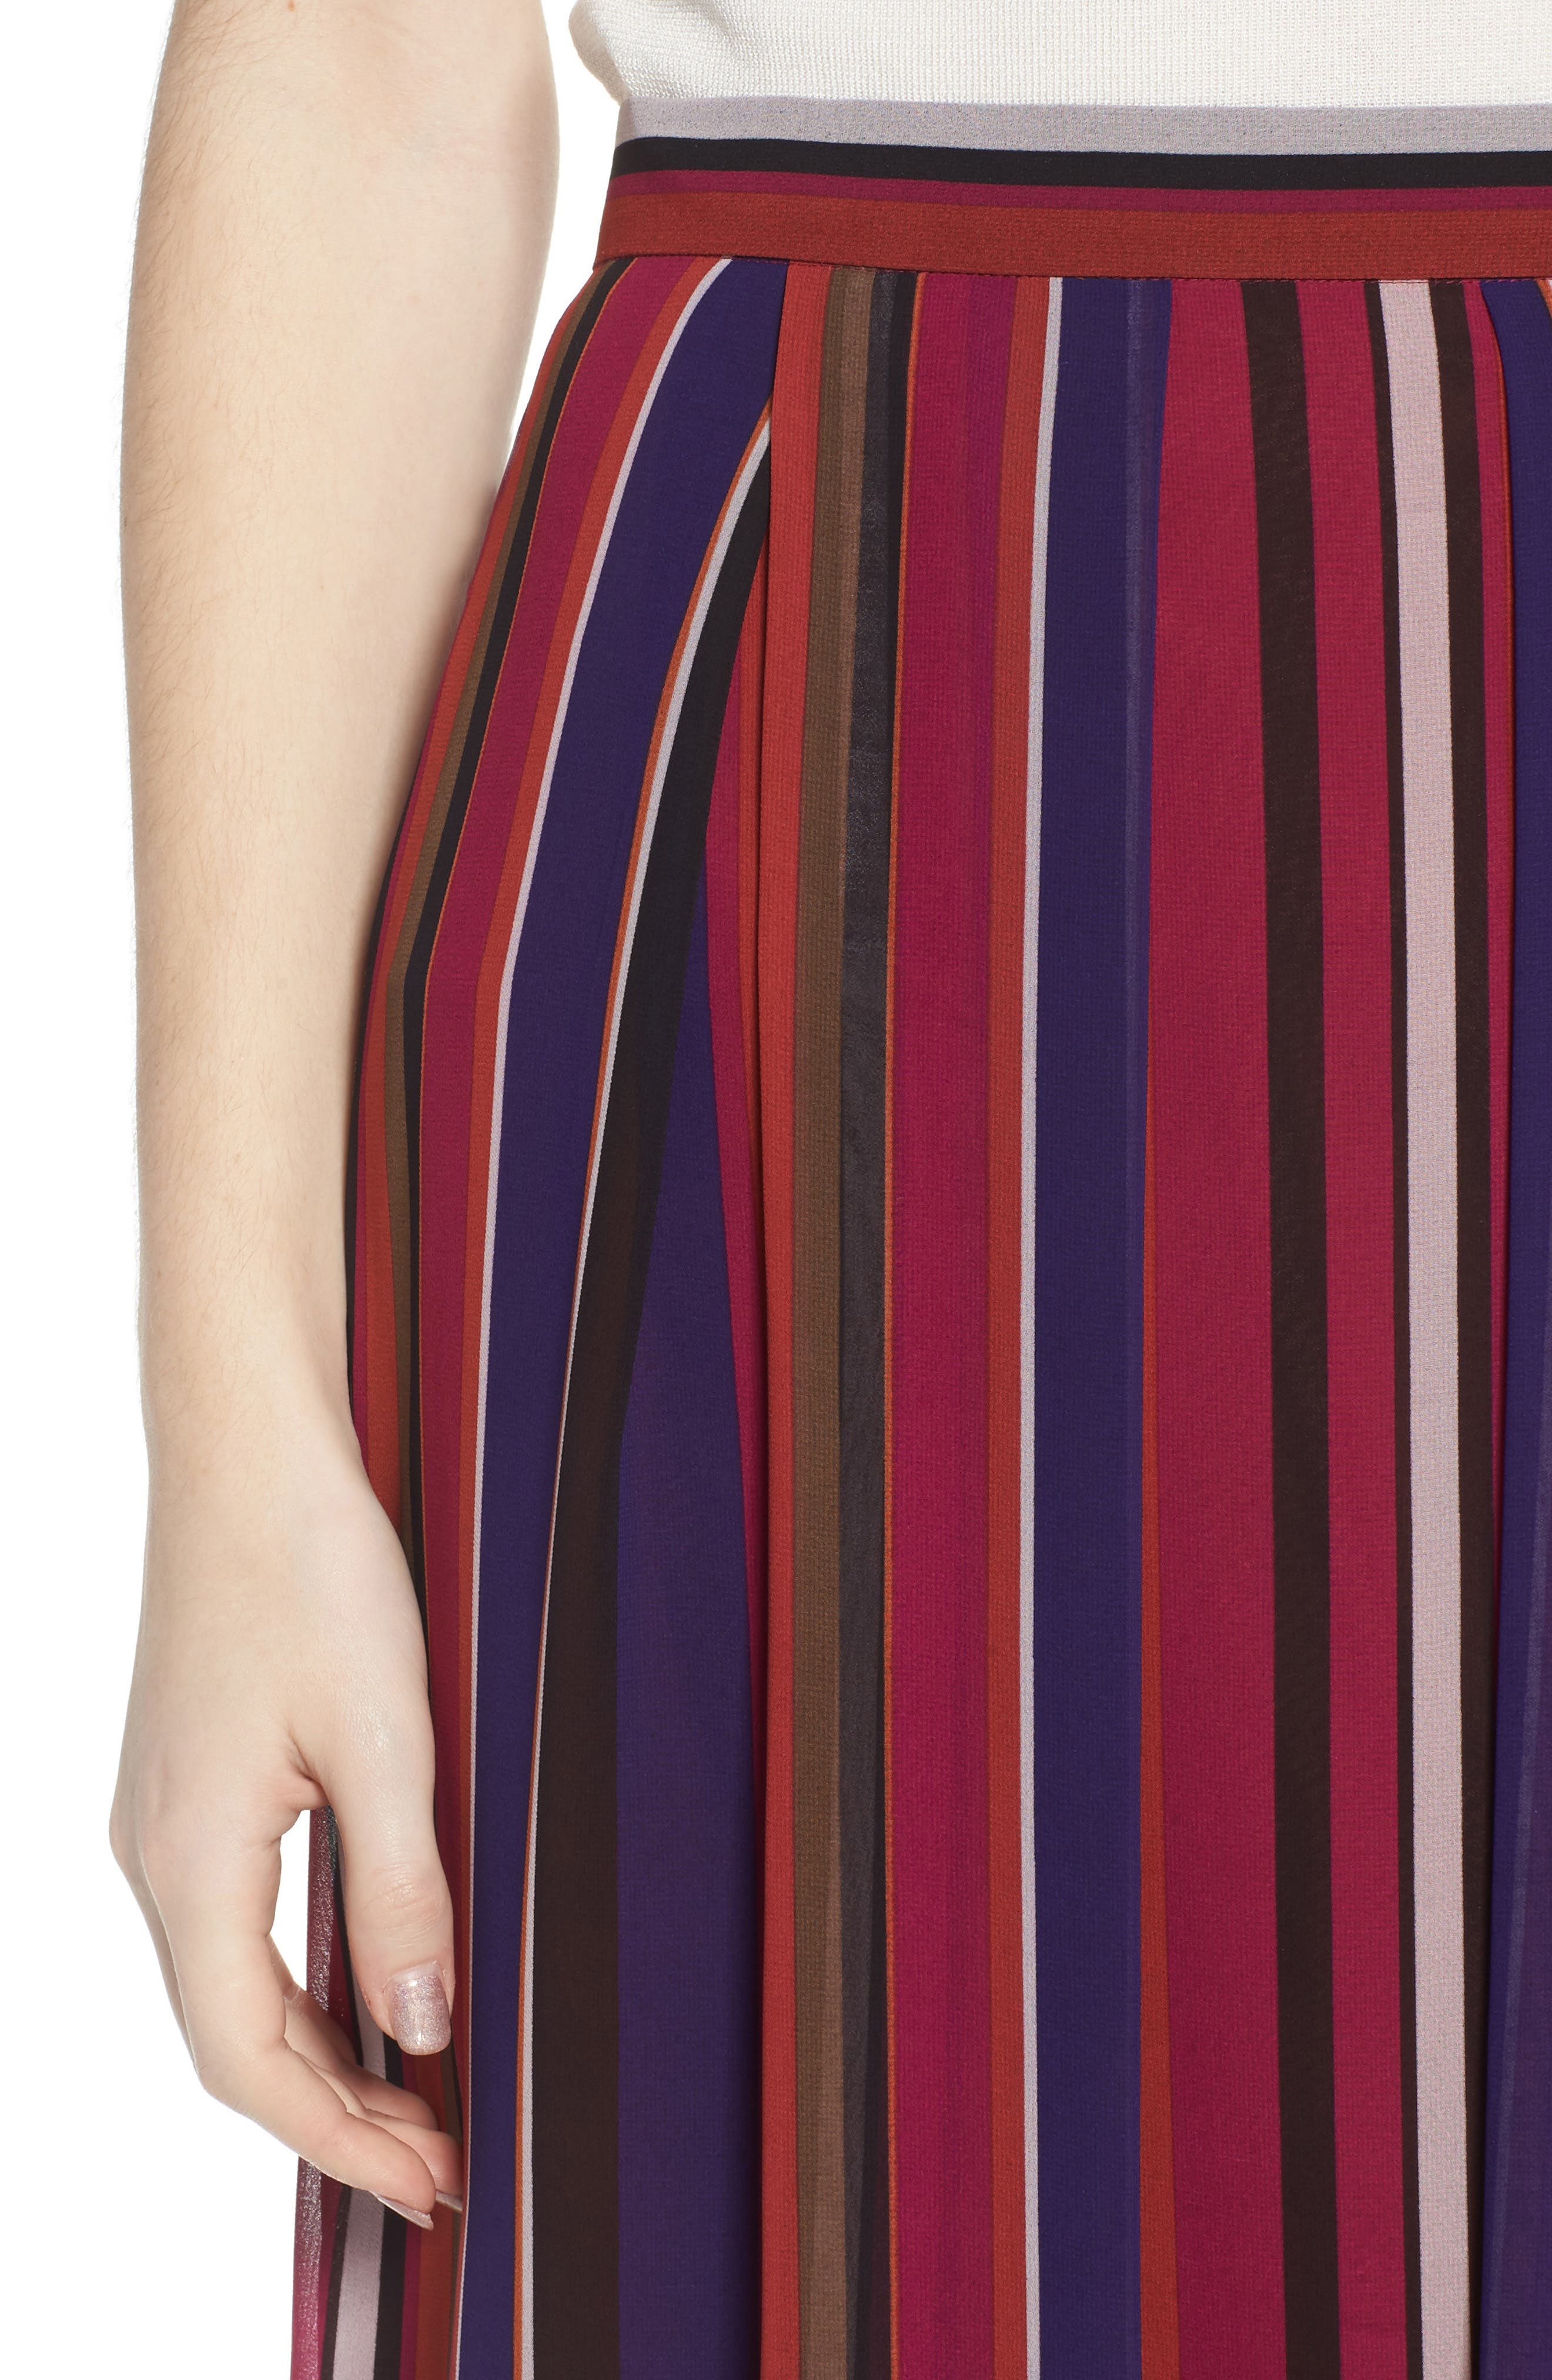 Striped Midi Skirt,                             Alternate thumbnail 4, color,                             African Violet Combo